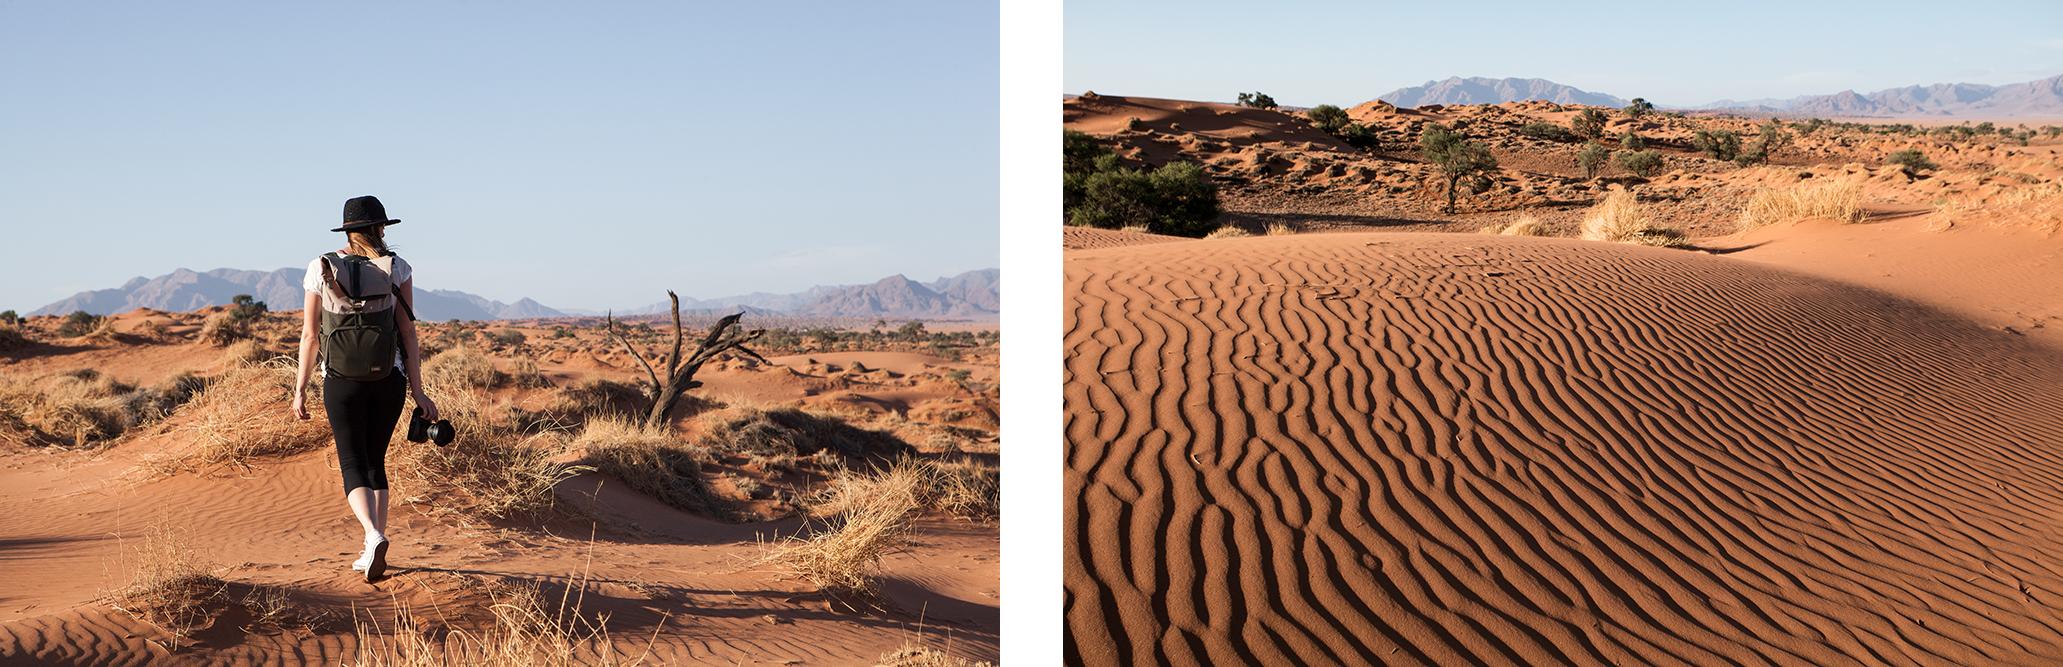 randonnee-namibie-namibrand